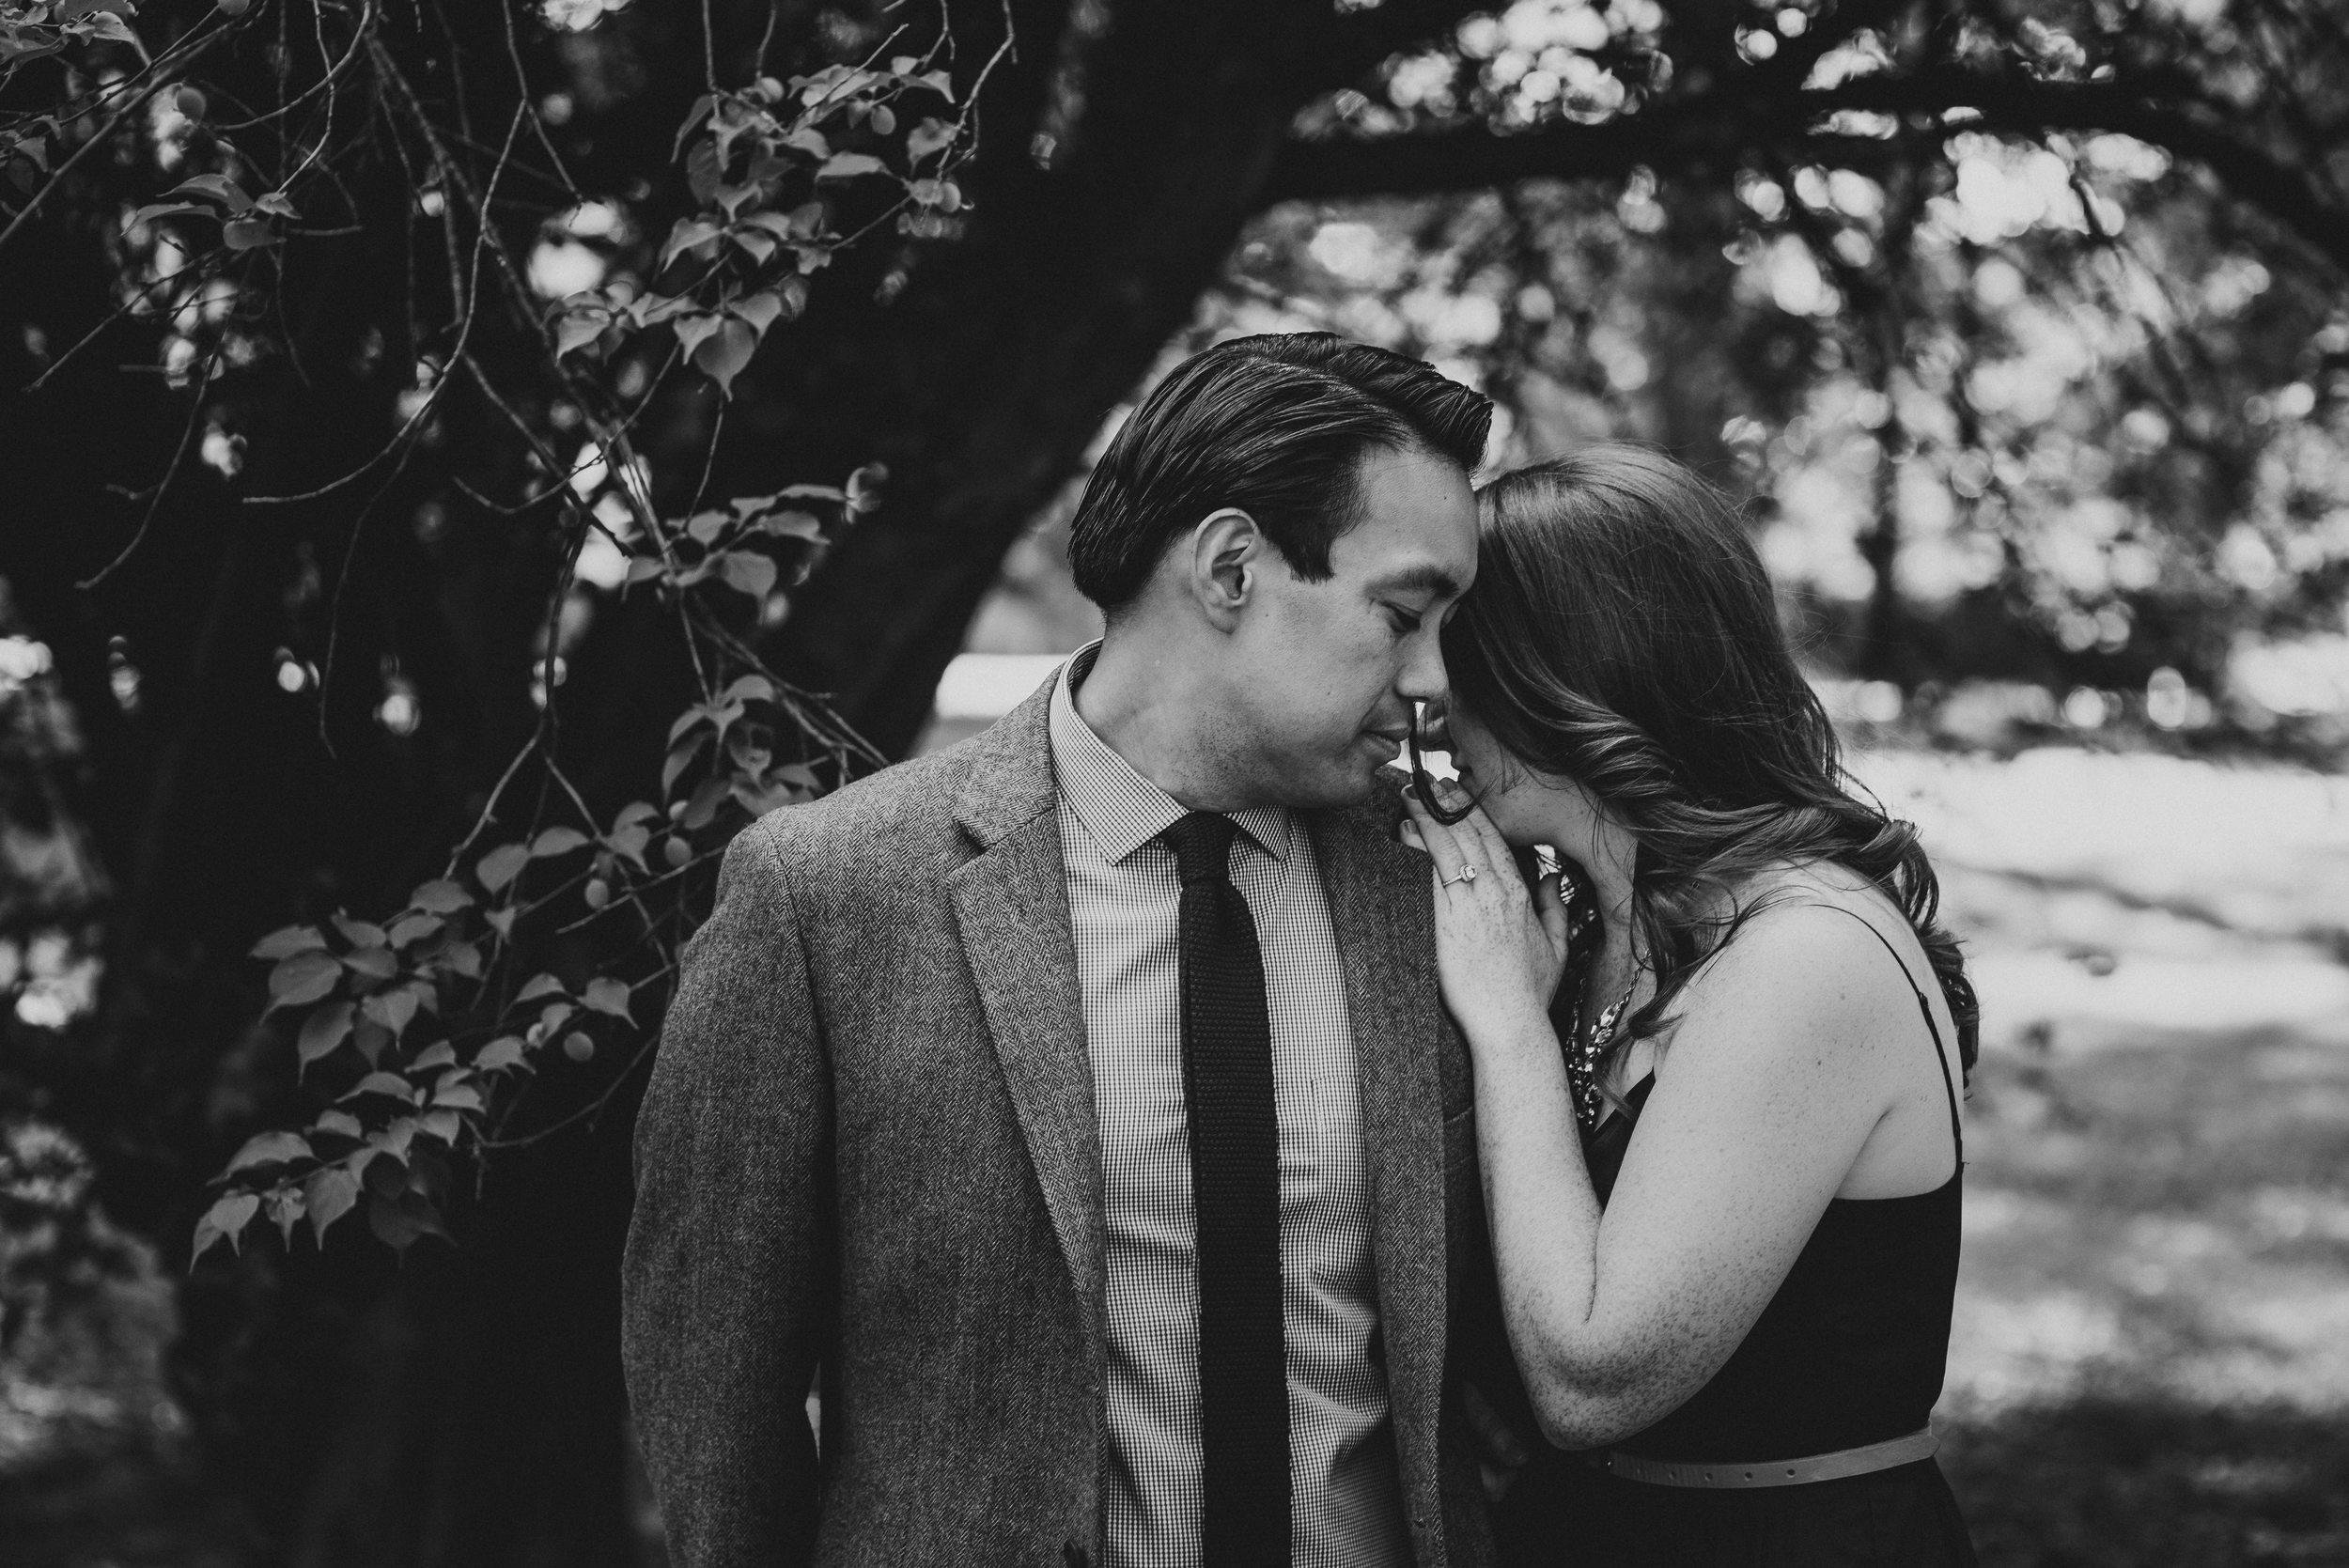 Best Engagement Photographer Washington DC Mantas Kubilinskas-5.jpg